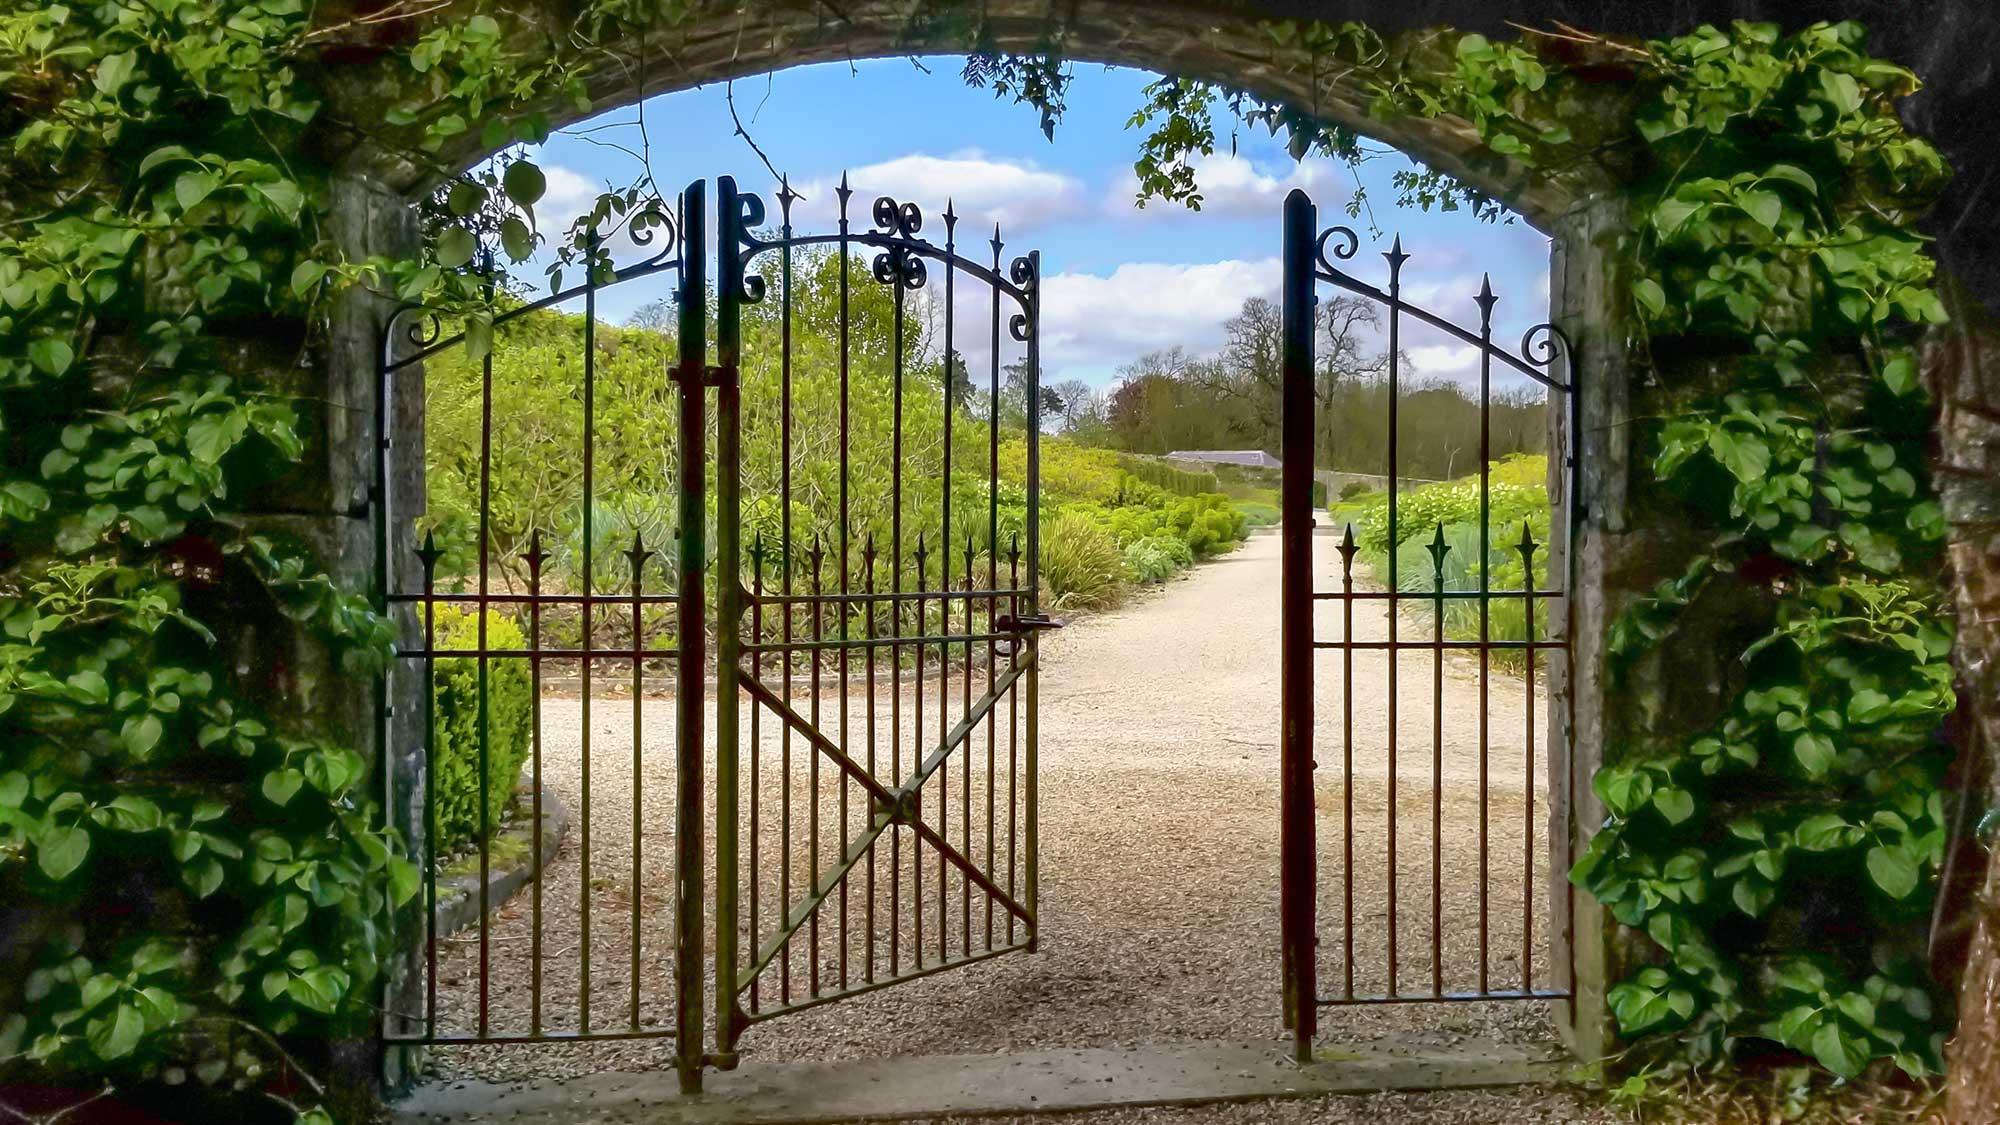 https://circaphiles.com/app/uploads/2020/10/Circaphiles-FAQ-Amy-Barnard-All-rights-reserved_Gate.jpg